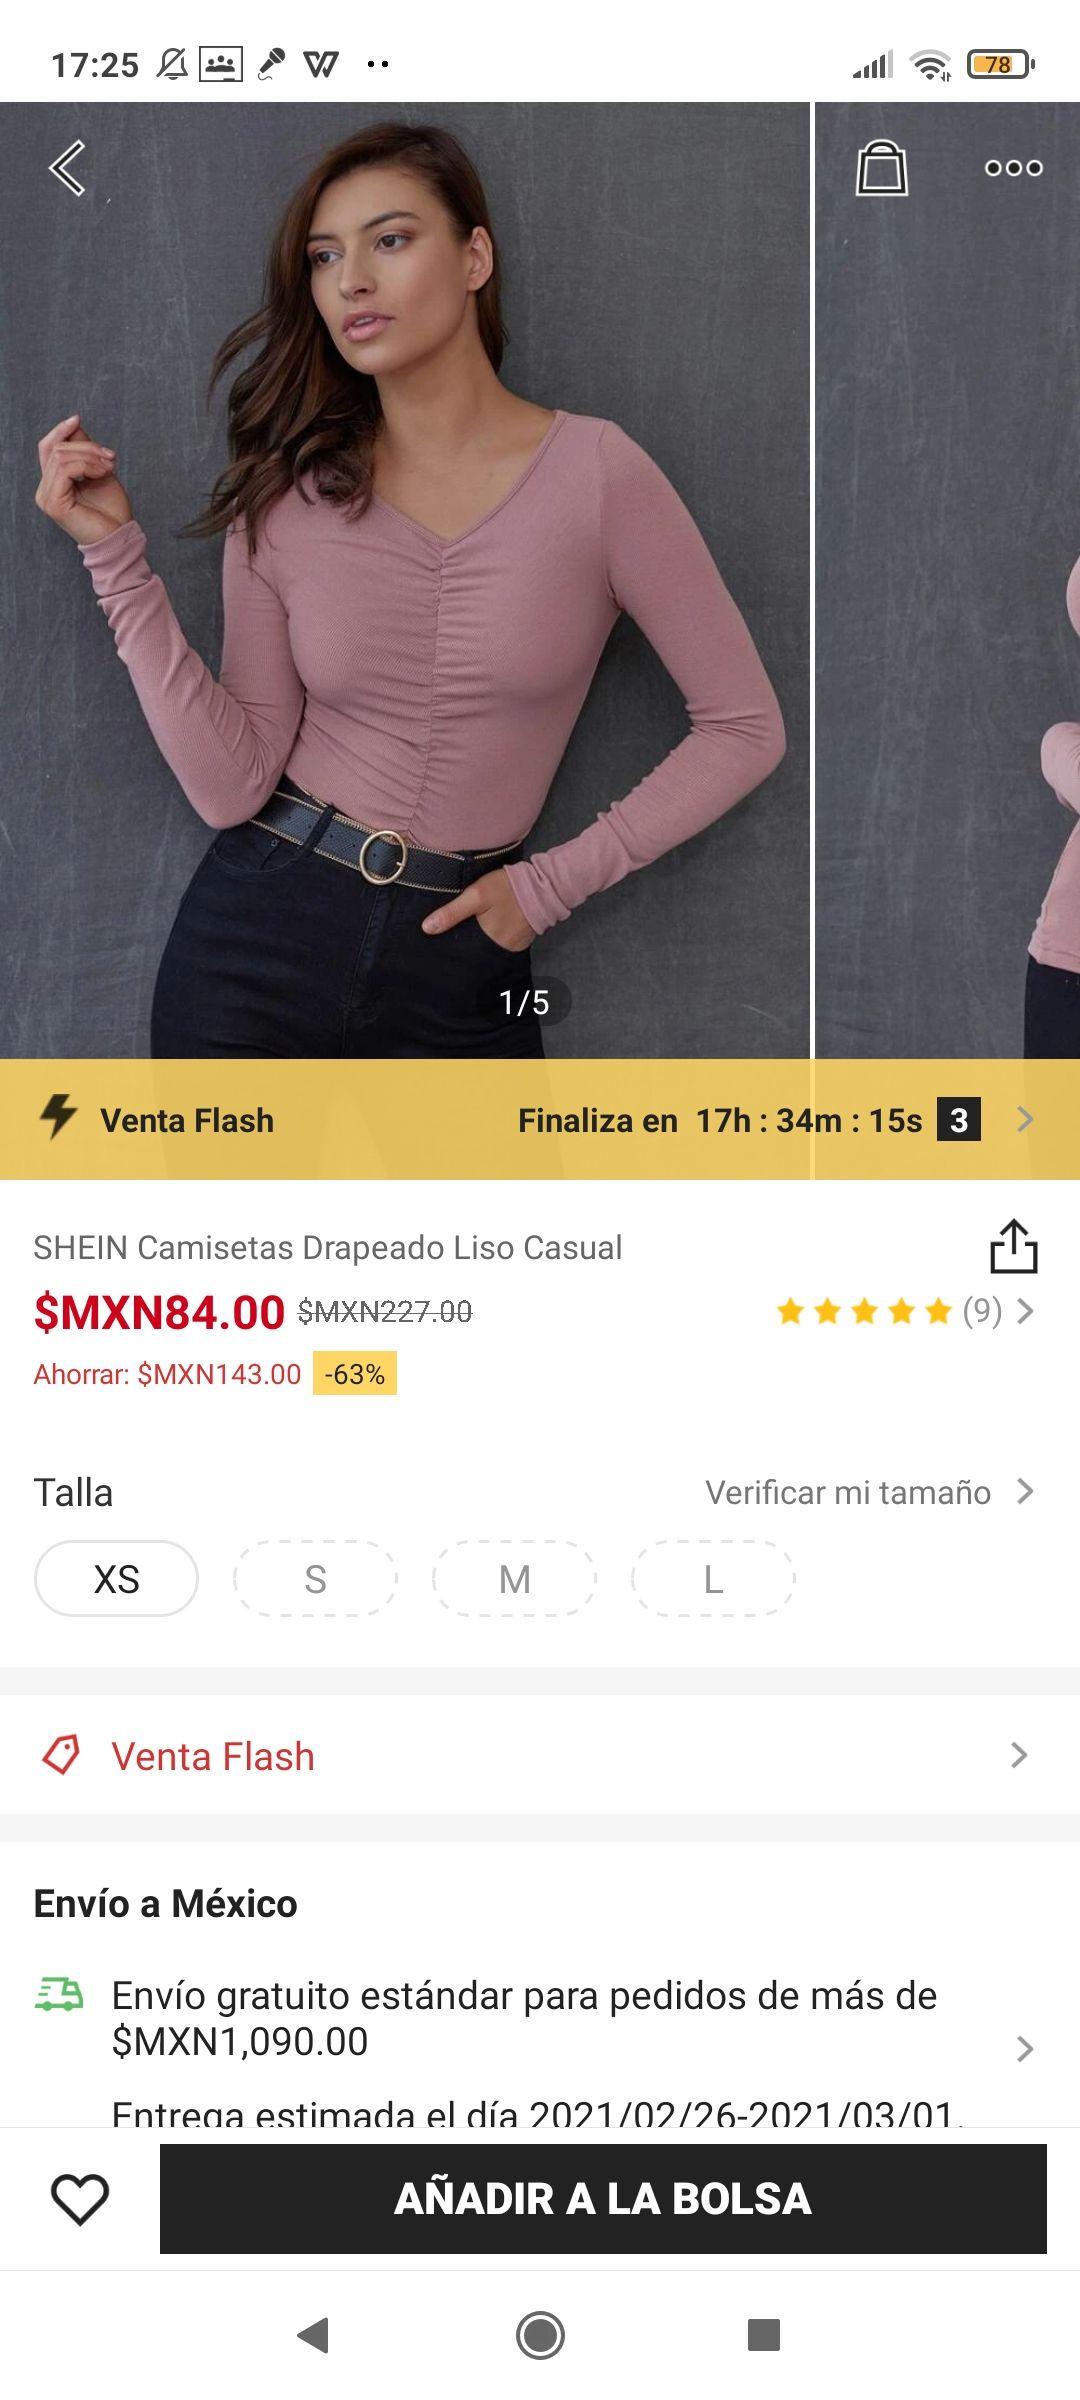 SHEIN: Blusa Drapeado Liso Casual